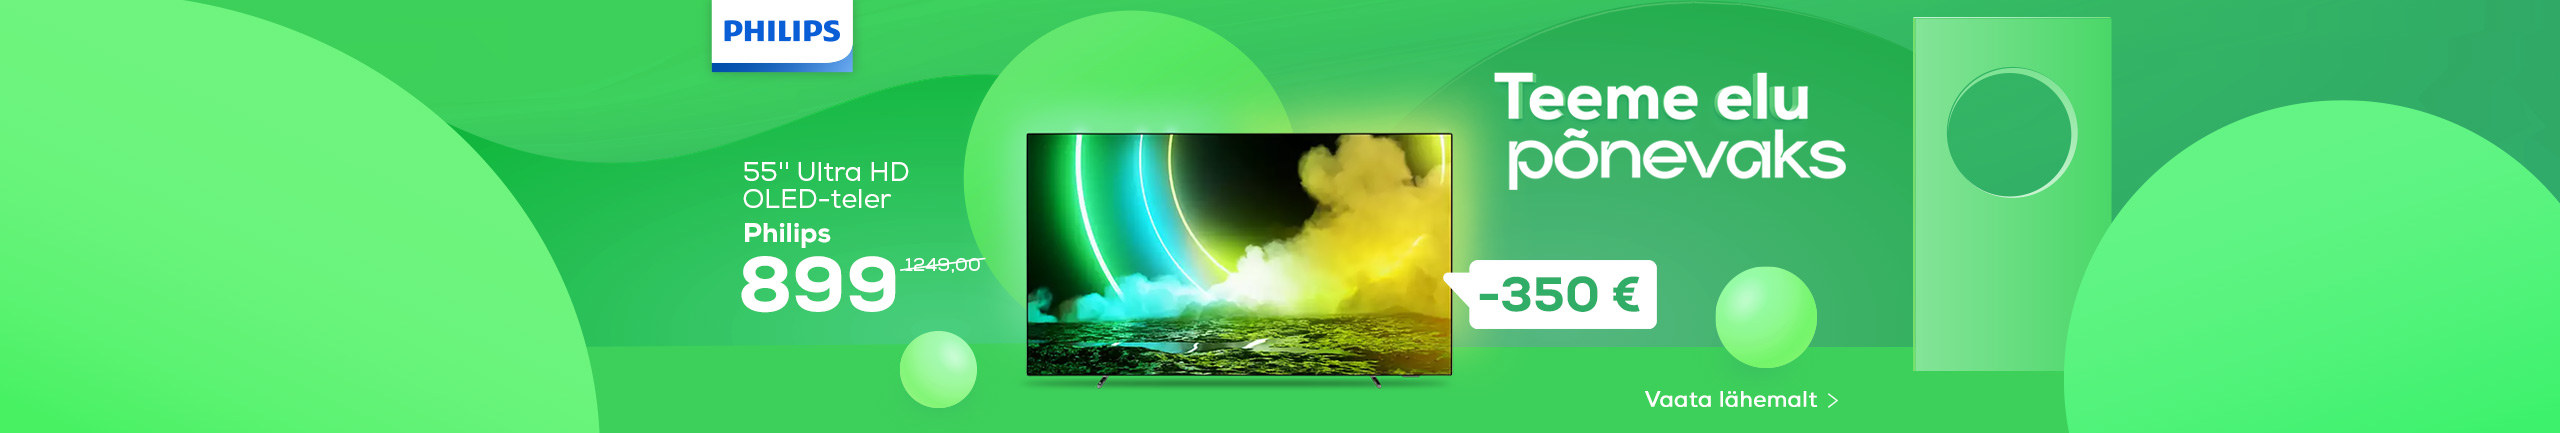 NPL We make life easy! Philips TV